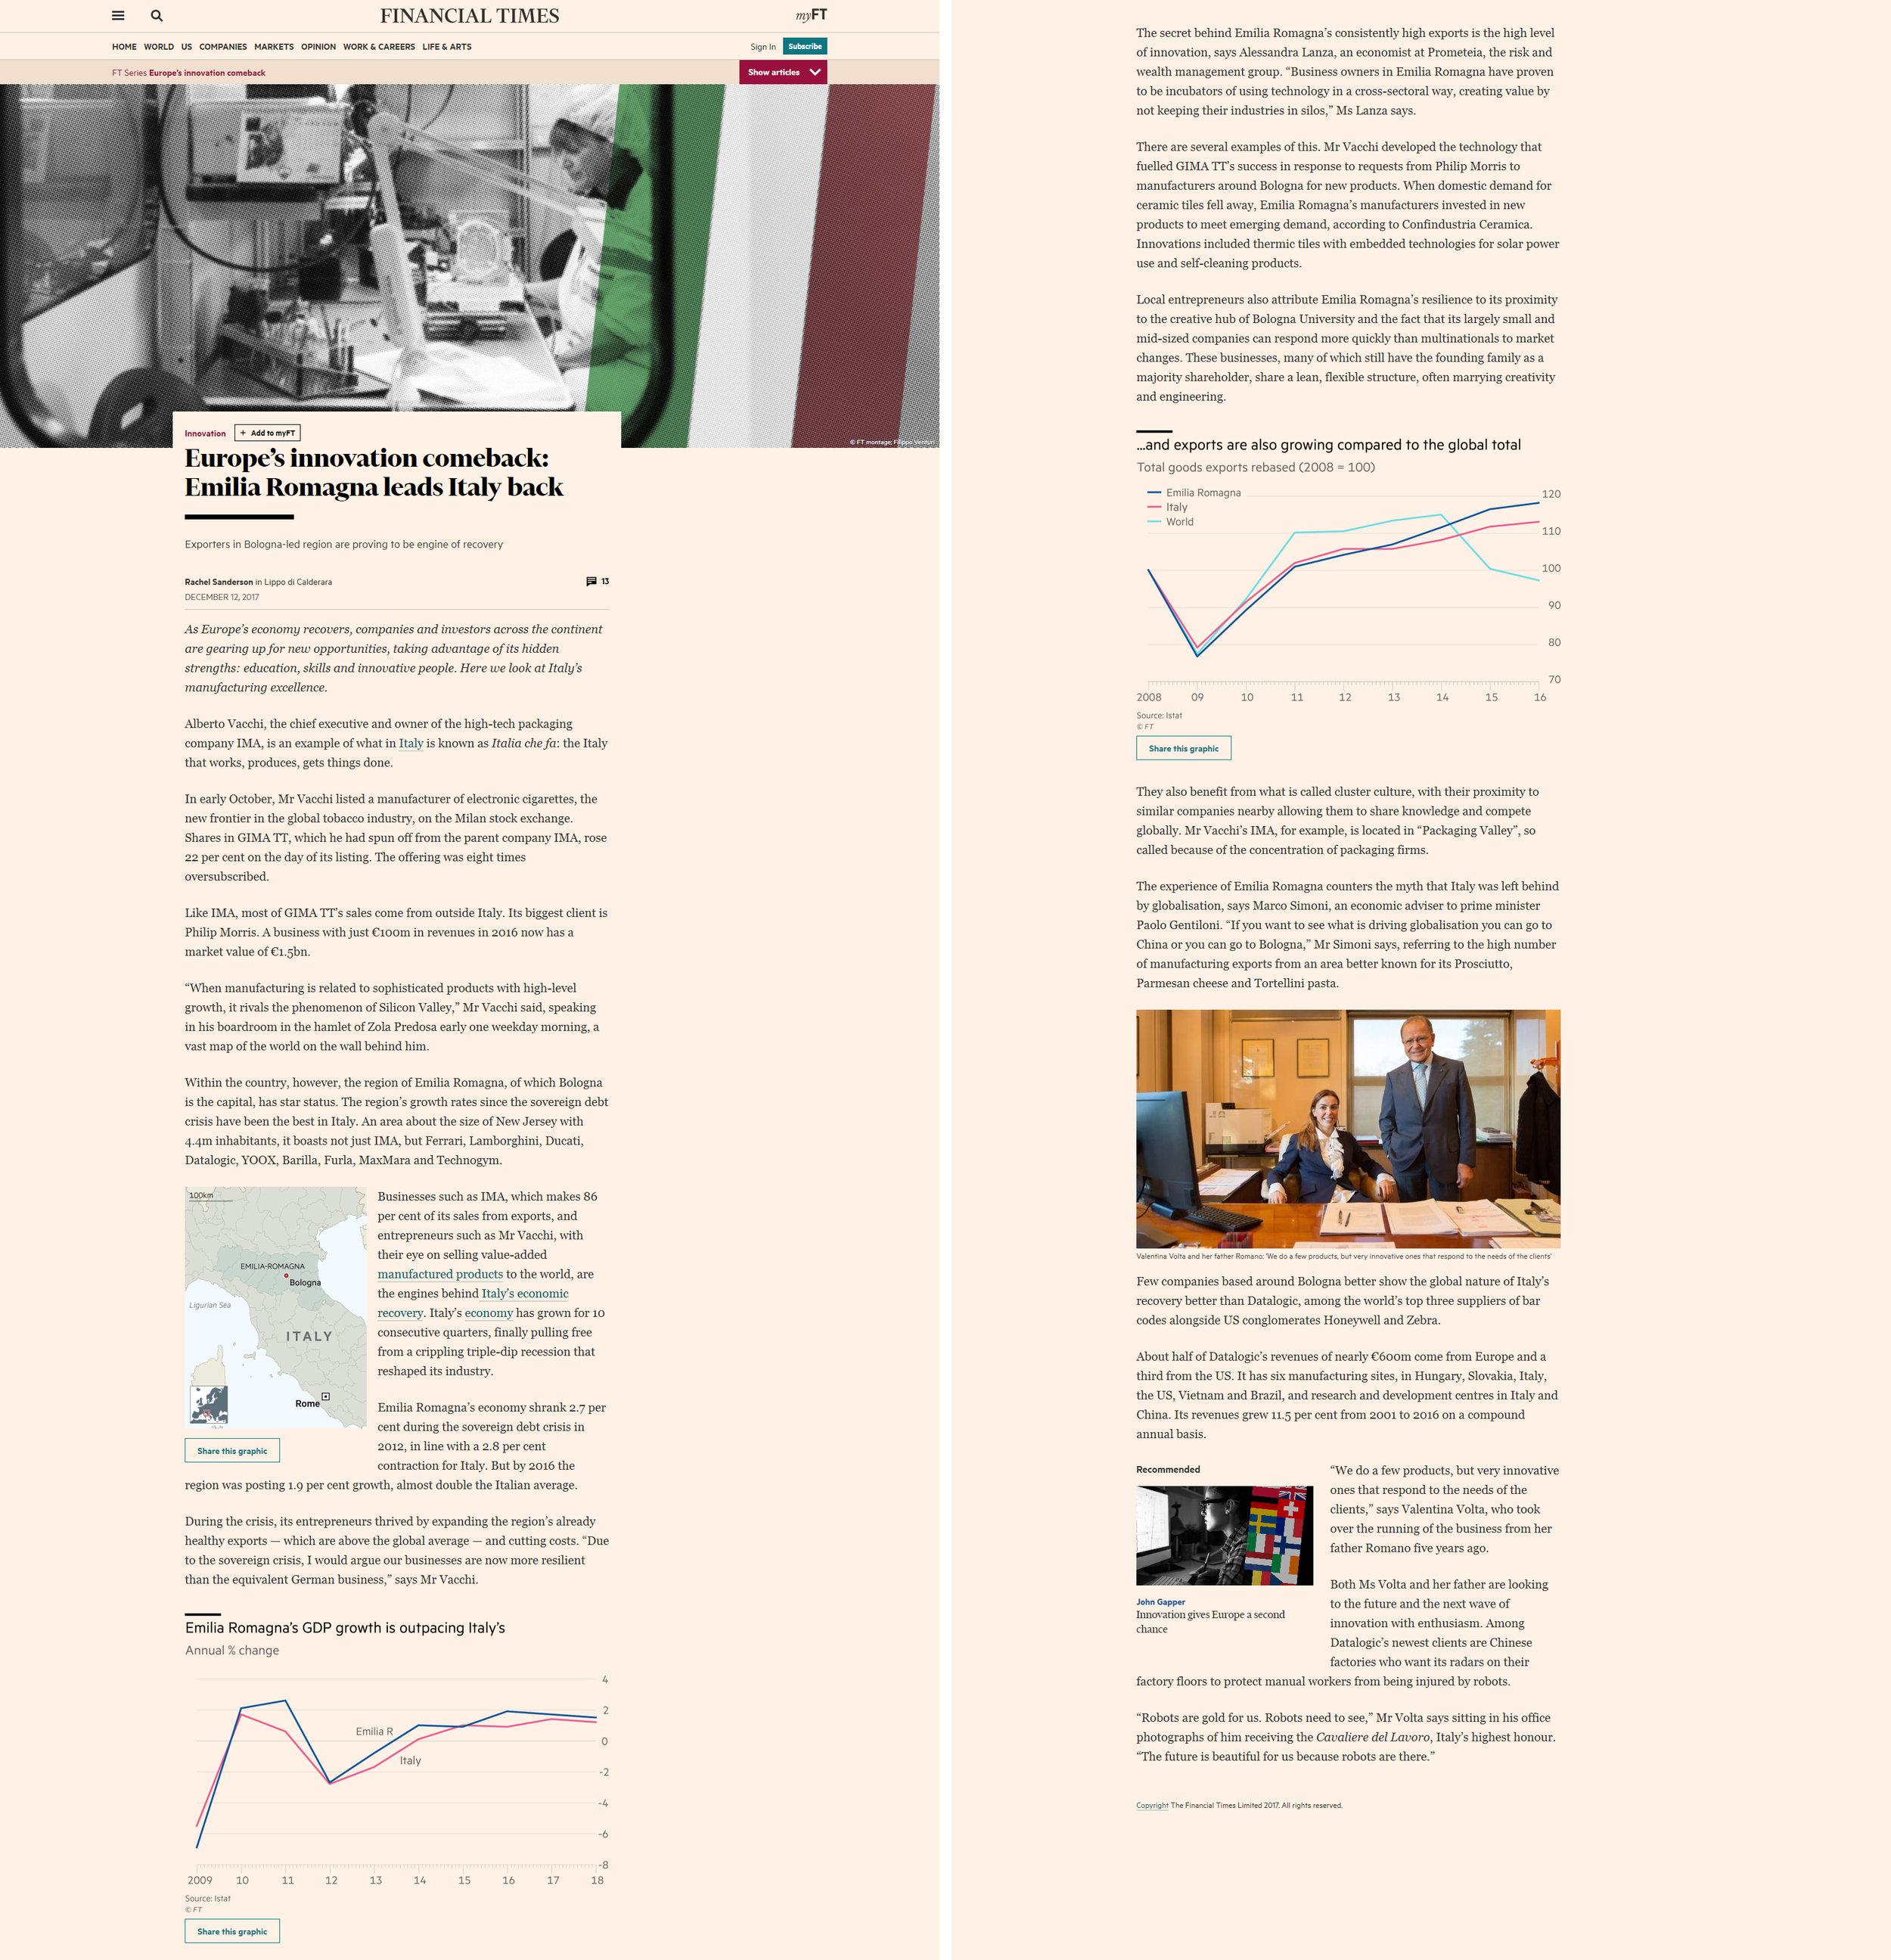 financial_times_article_1.jpg